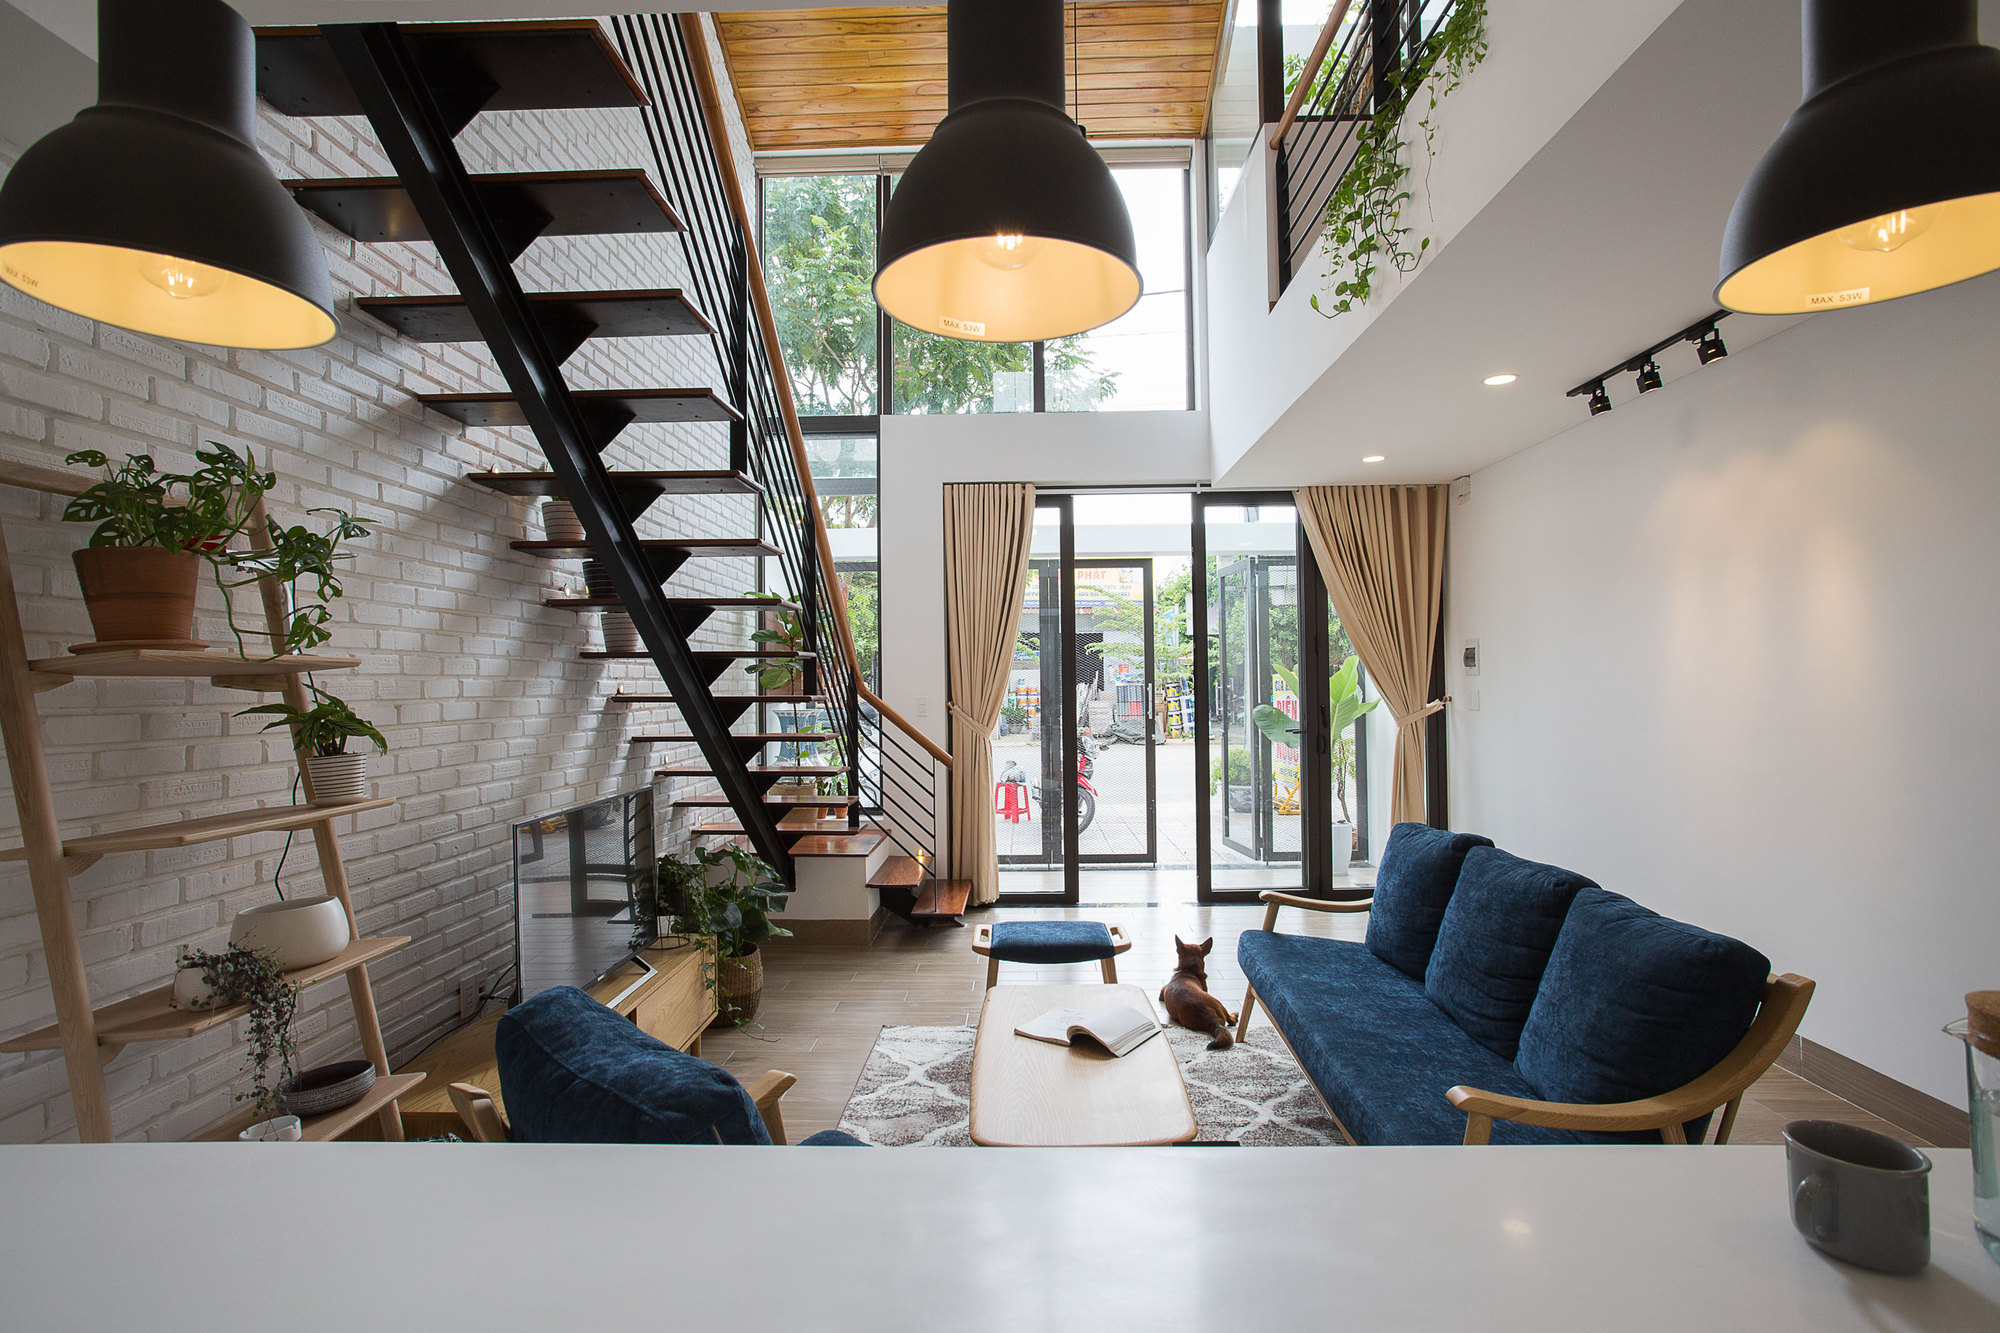 Minimalist House 85 Design - 12